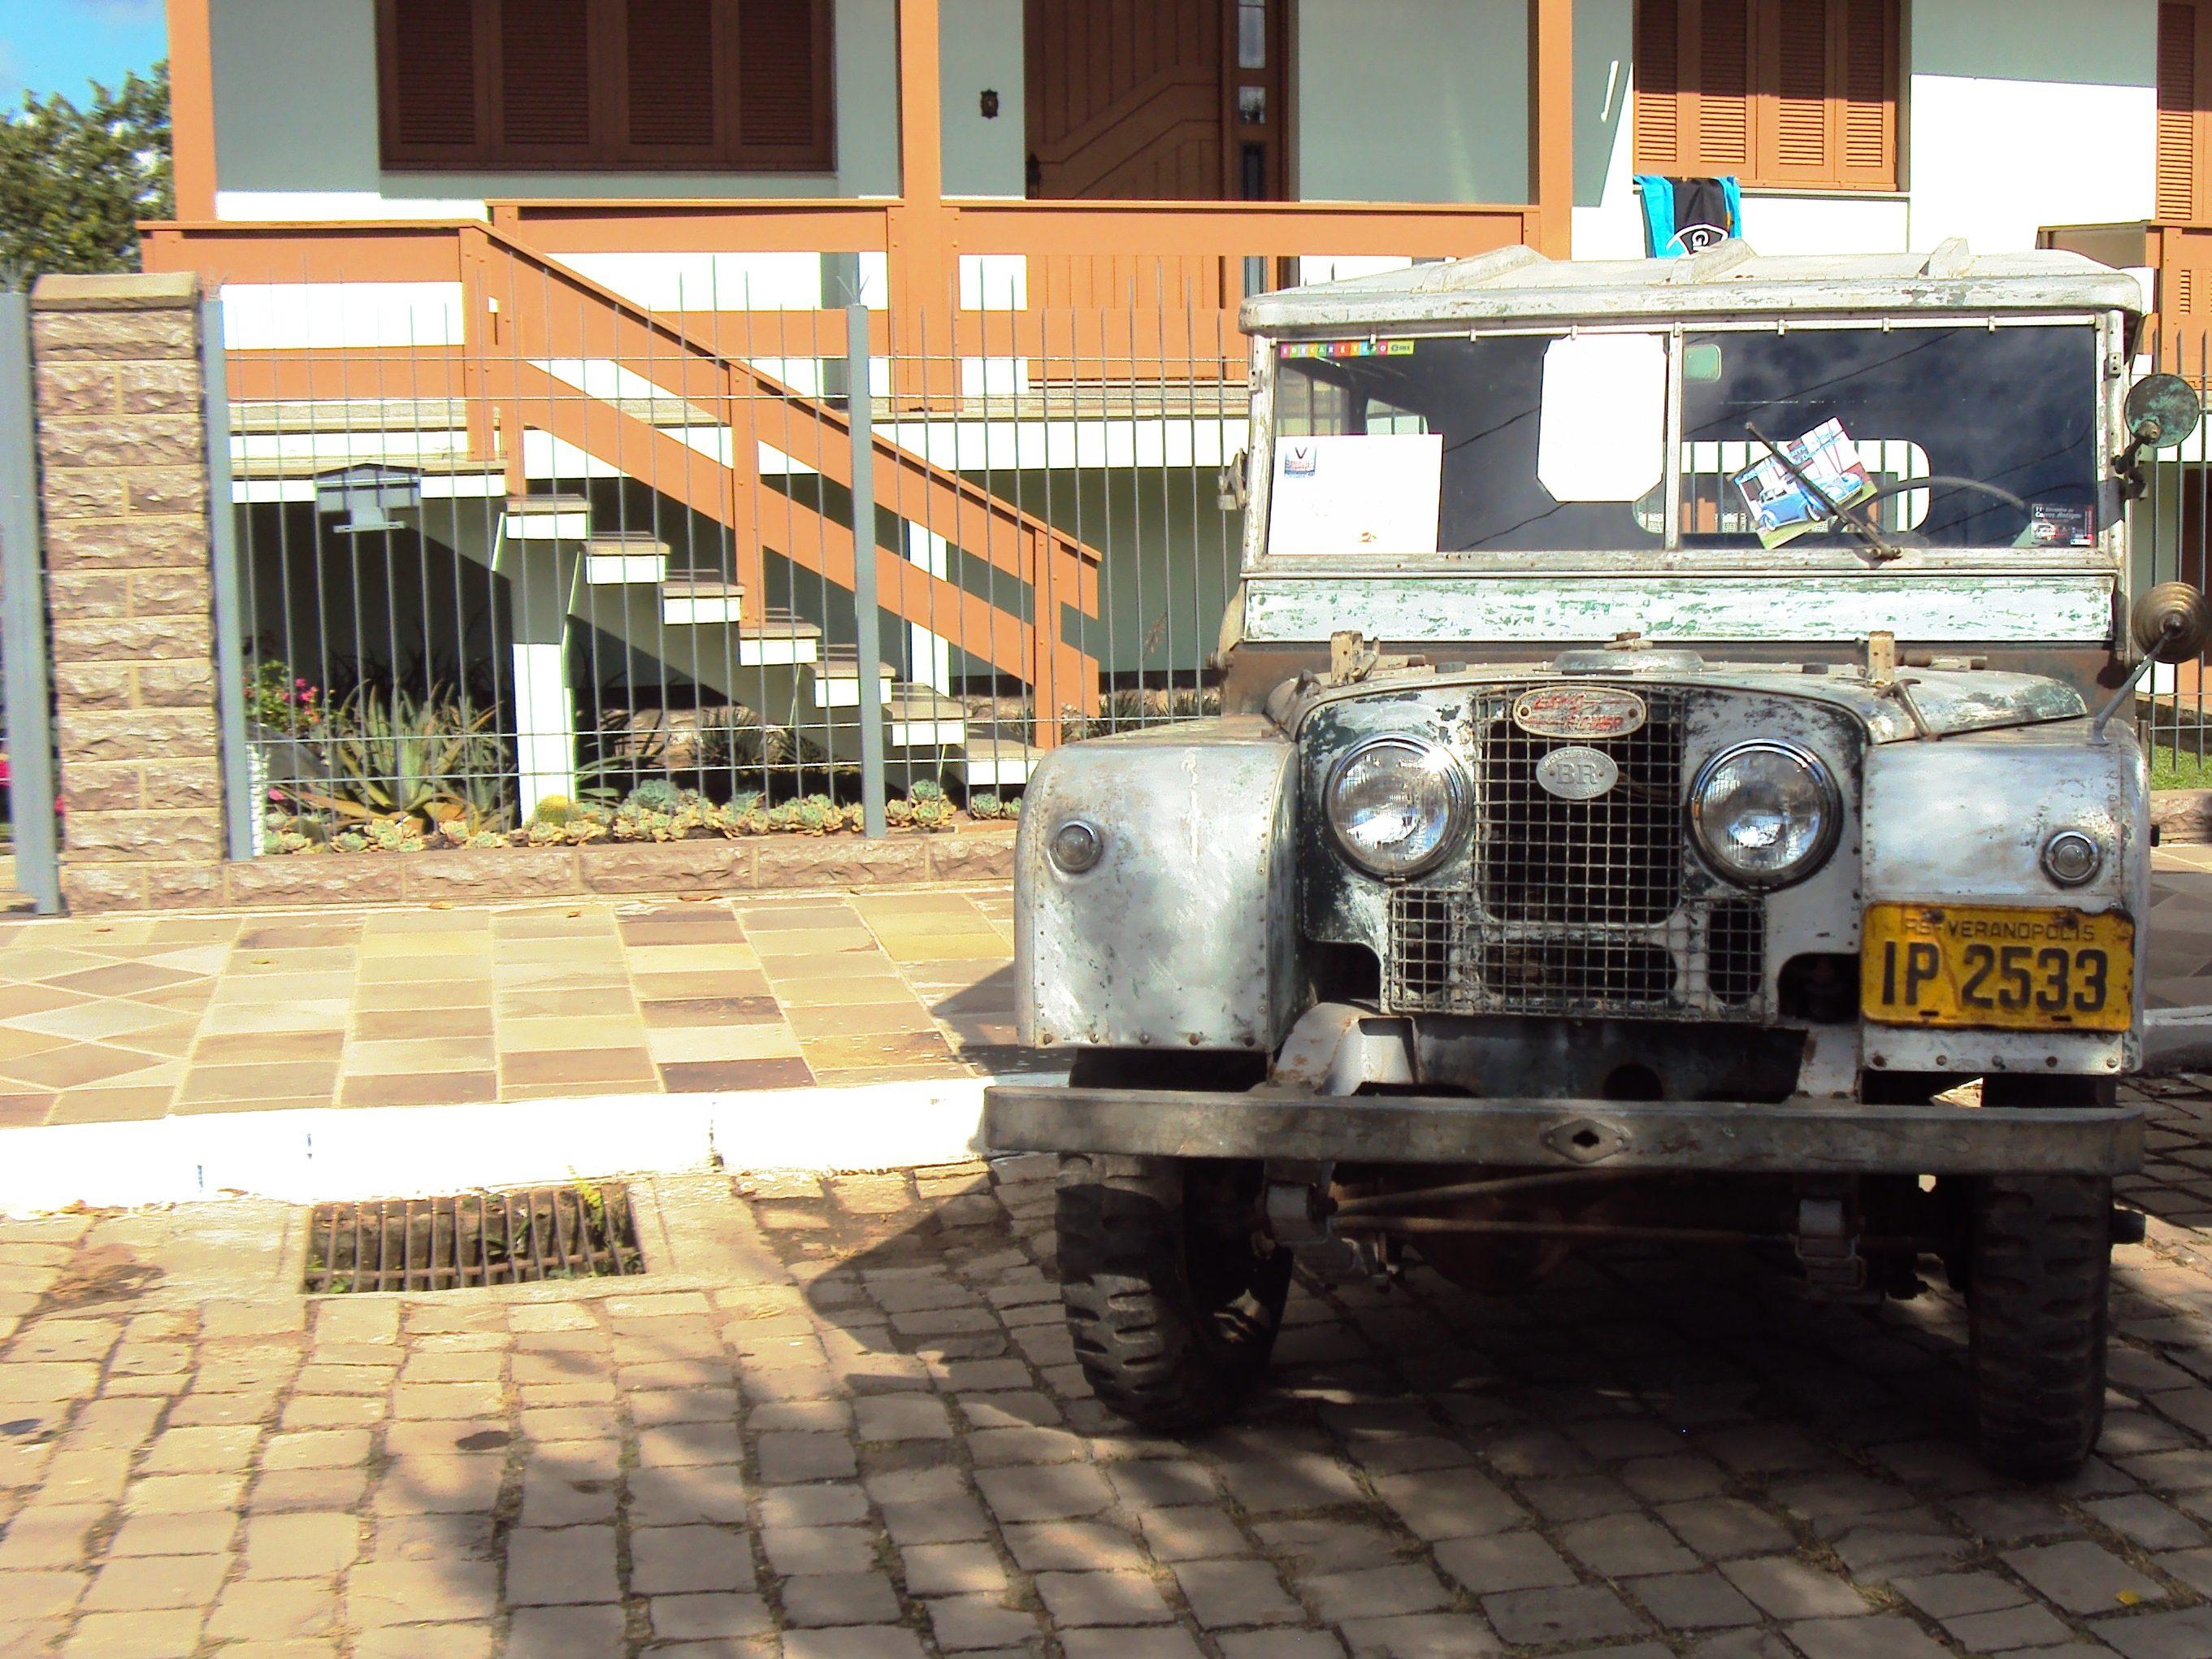 uCesar_LandRover1951_Farroupilha-II Land Rover (1951)